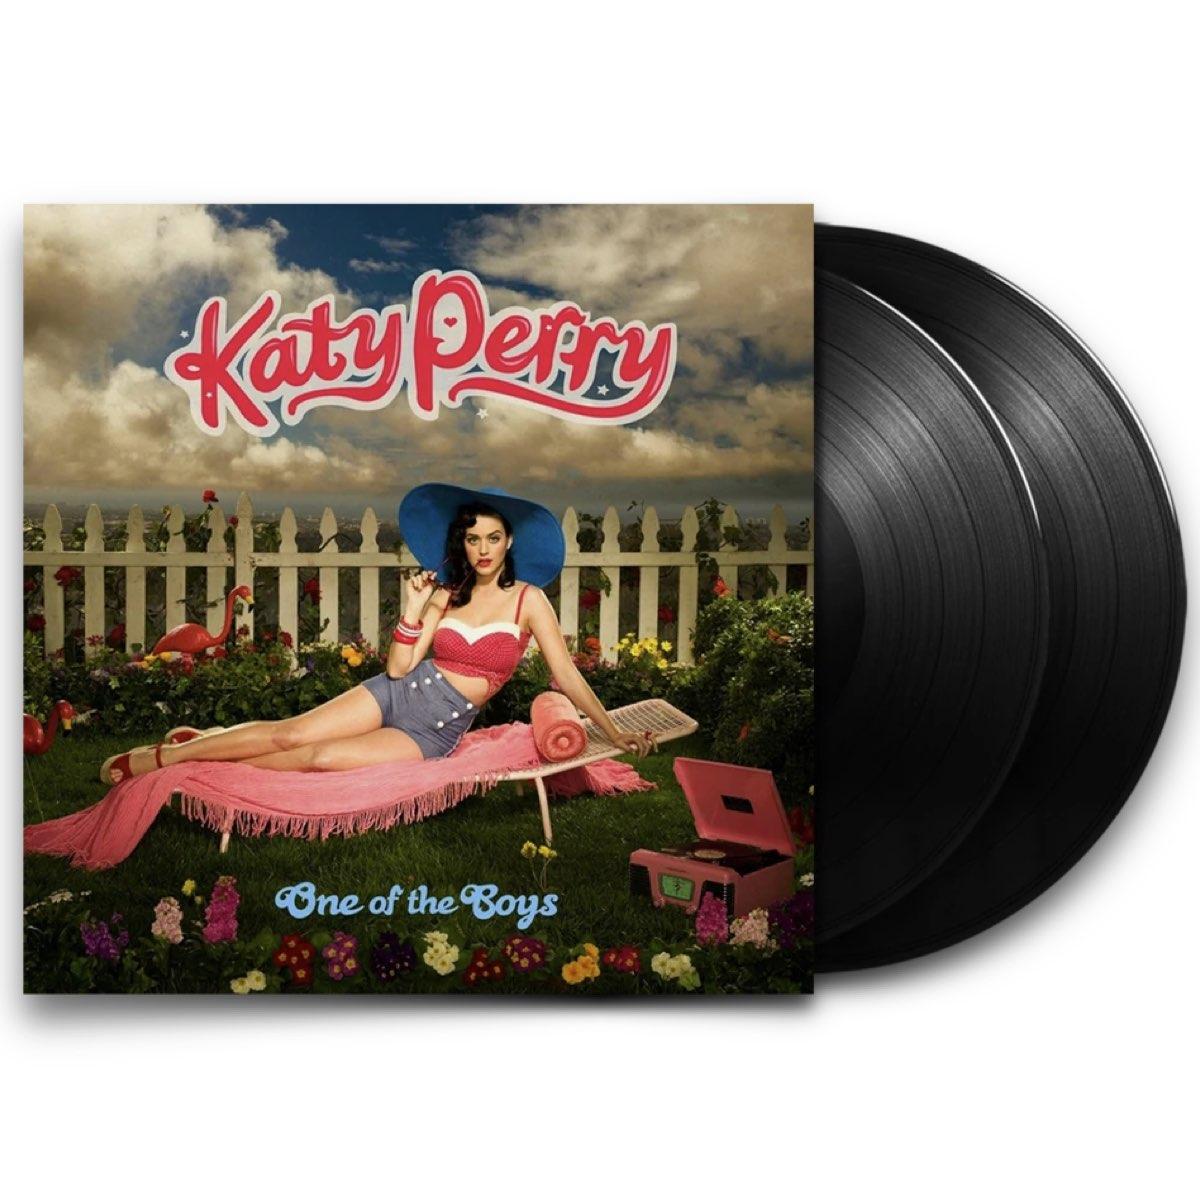 Katy Perry - One Of The Boys [Double Black Vinyl]